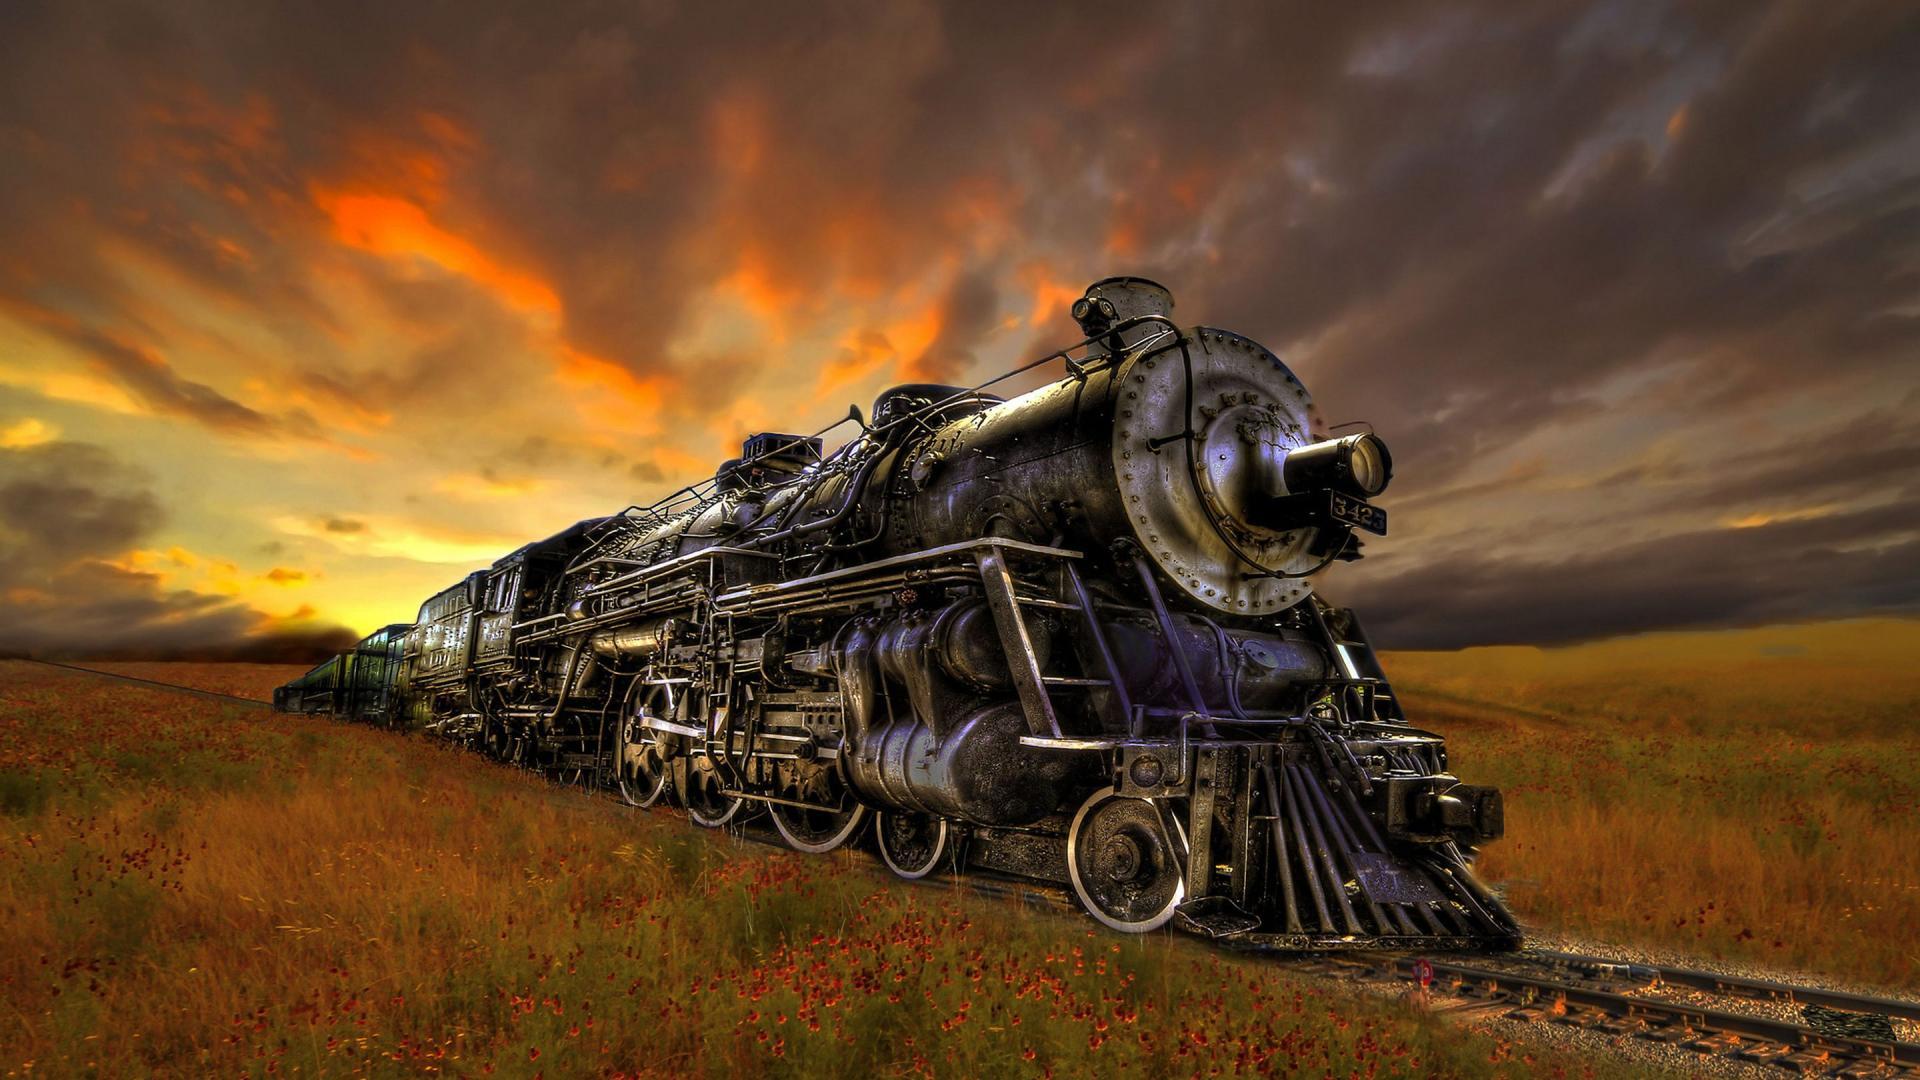 48 Hd Train Wallpaper On Wallpapersafari